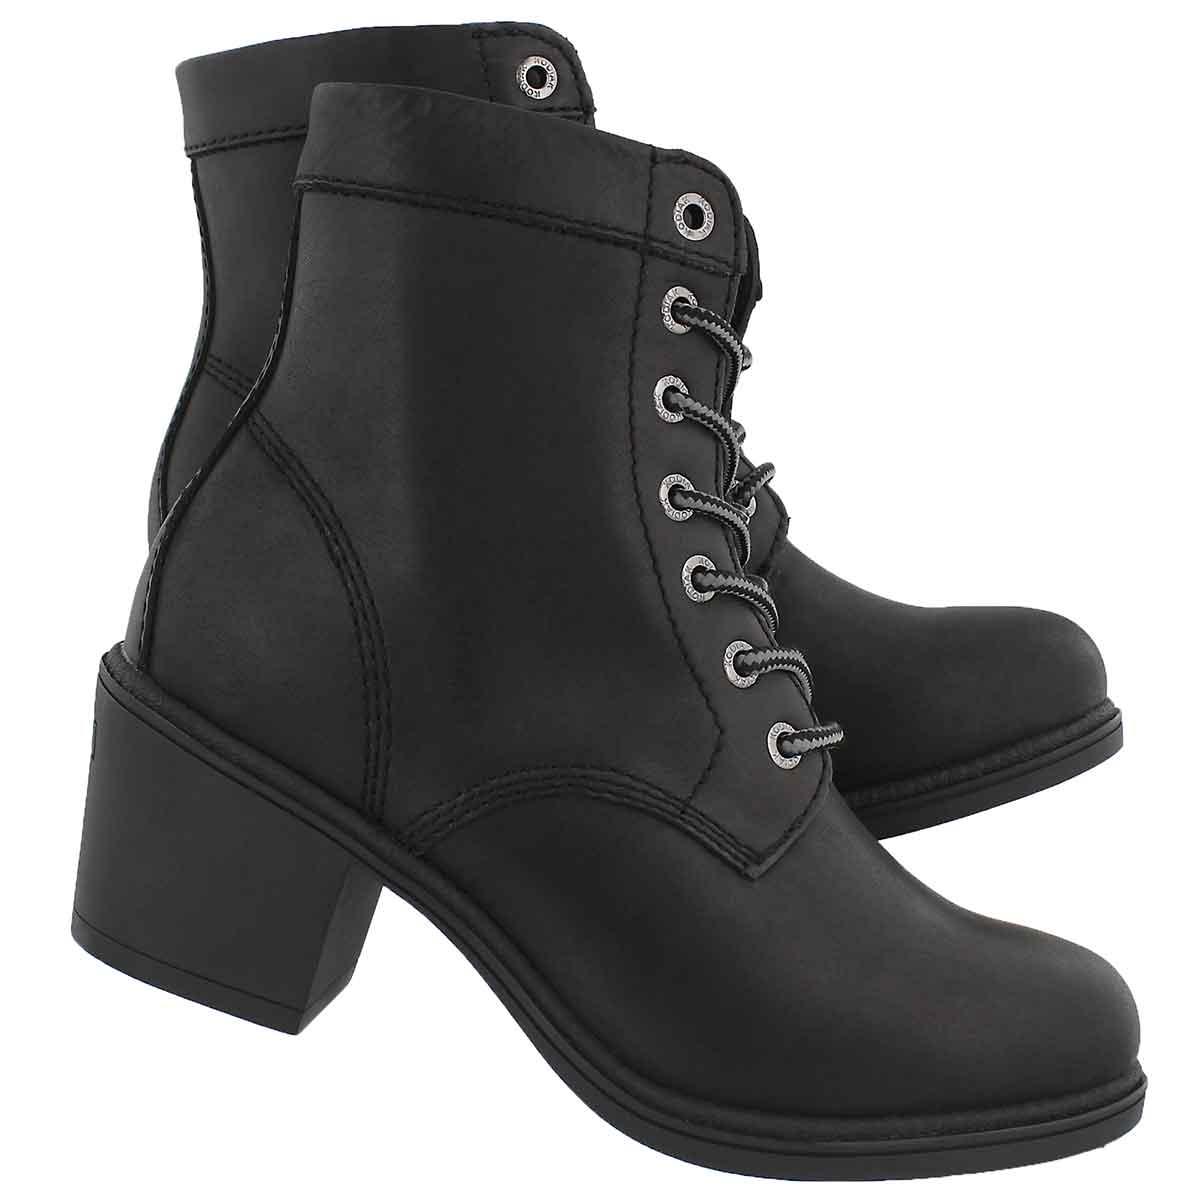 Lds Claire blk wtpf lace up ankle bootie